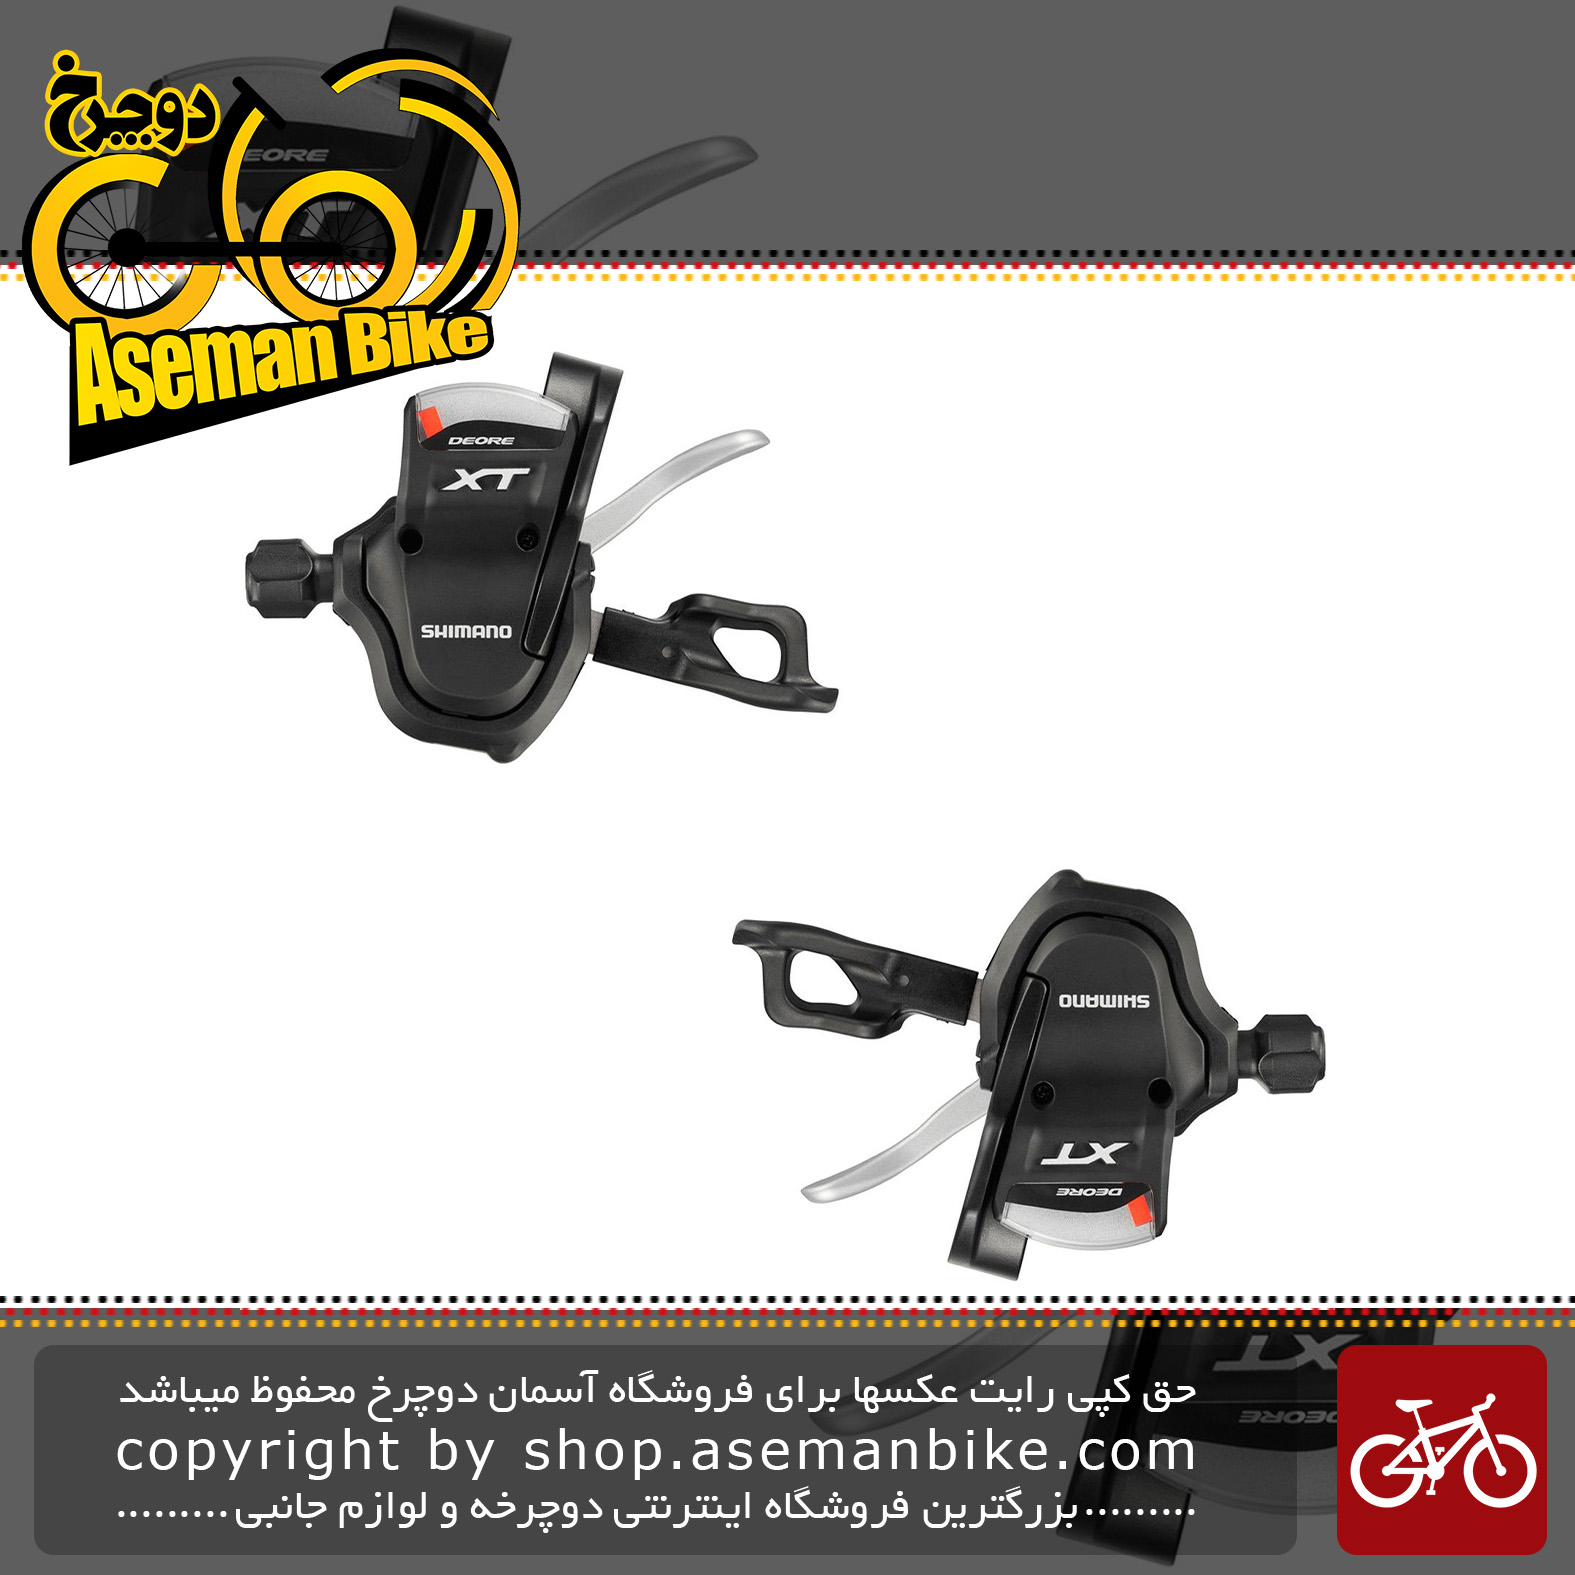 دسته دنده شیمانو دیور ایکس تی رپید فایر 2/3 در 10 سرعته Shimano Shifter Bicycle Deore XT SL-M780 2/3x10 speed Japan